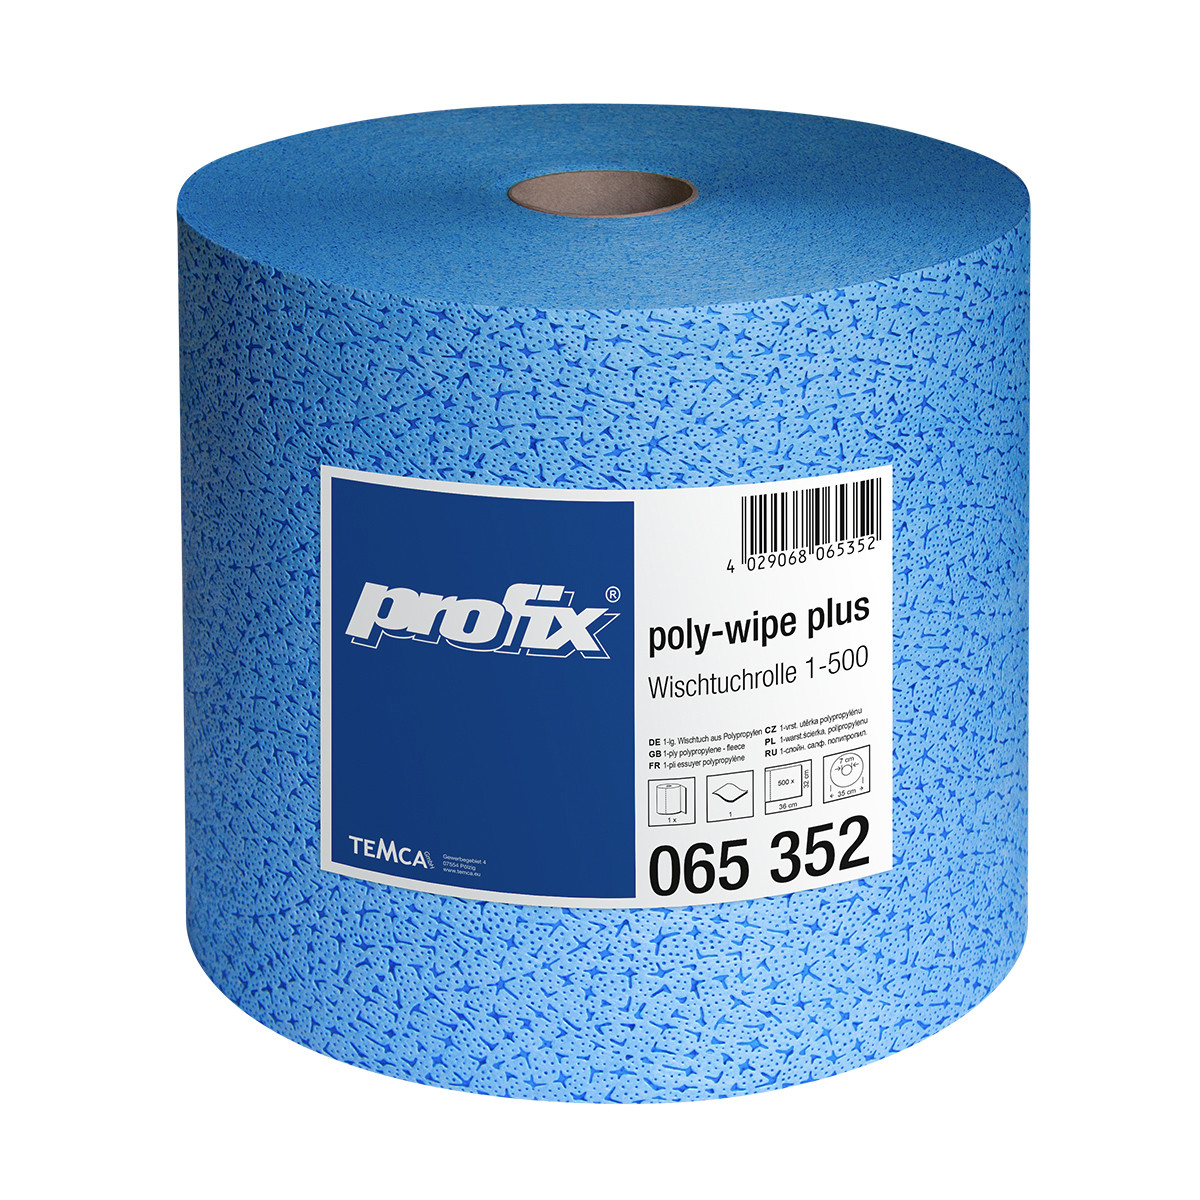 Салфетки протирочные в рулоне TEMCA Profix Poly-Wipe Plus, 32х36см, 500 листов